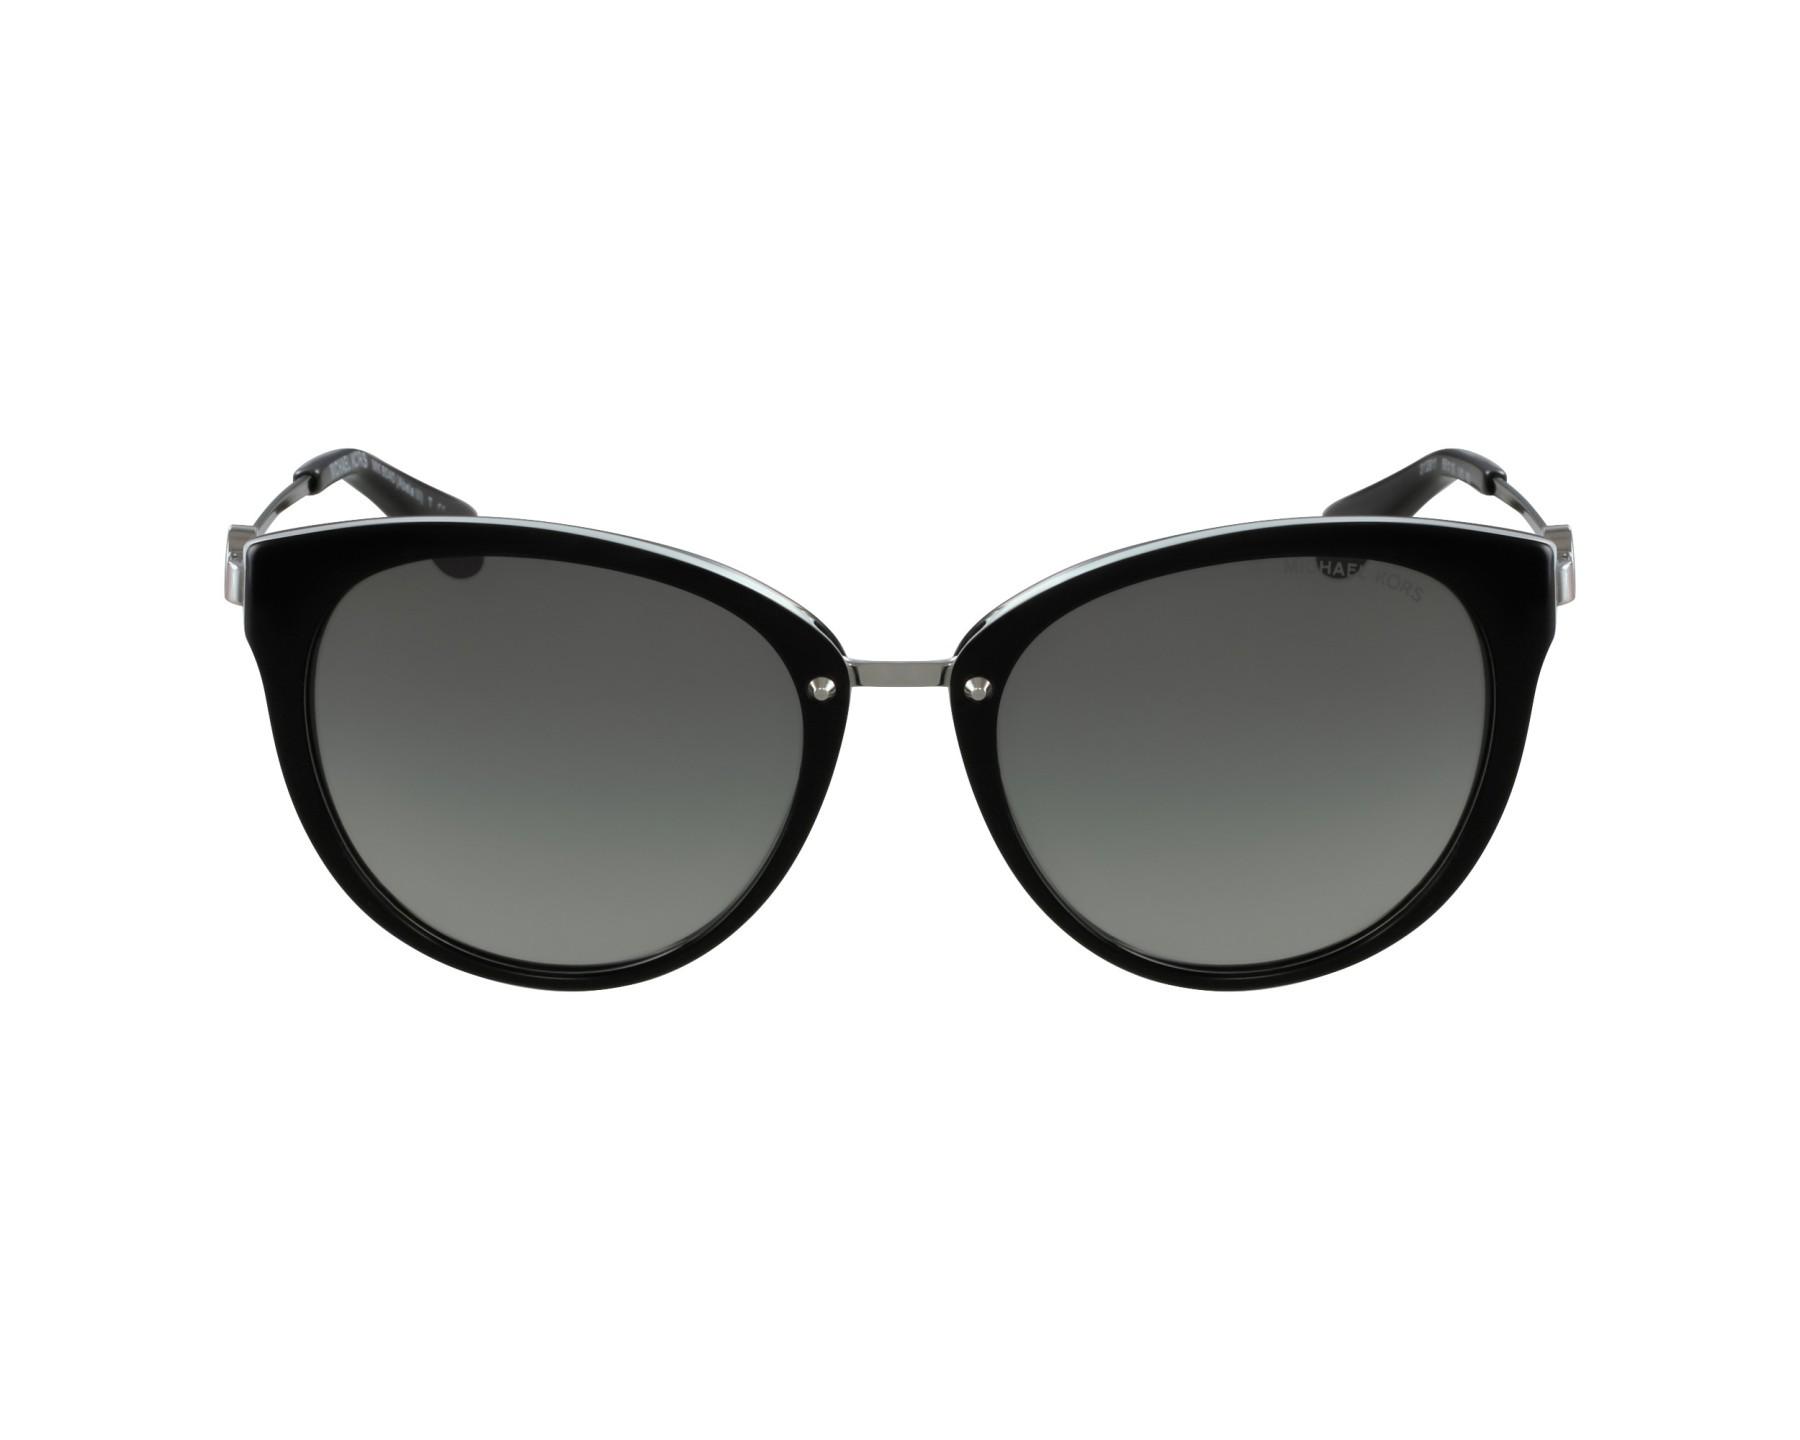 acheter des lunettes de soleil michael kors mk 6040 312911 visionet. Black Bedroom Furniture Sets. Home Design Ideas